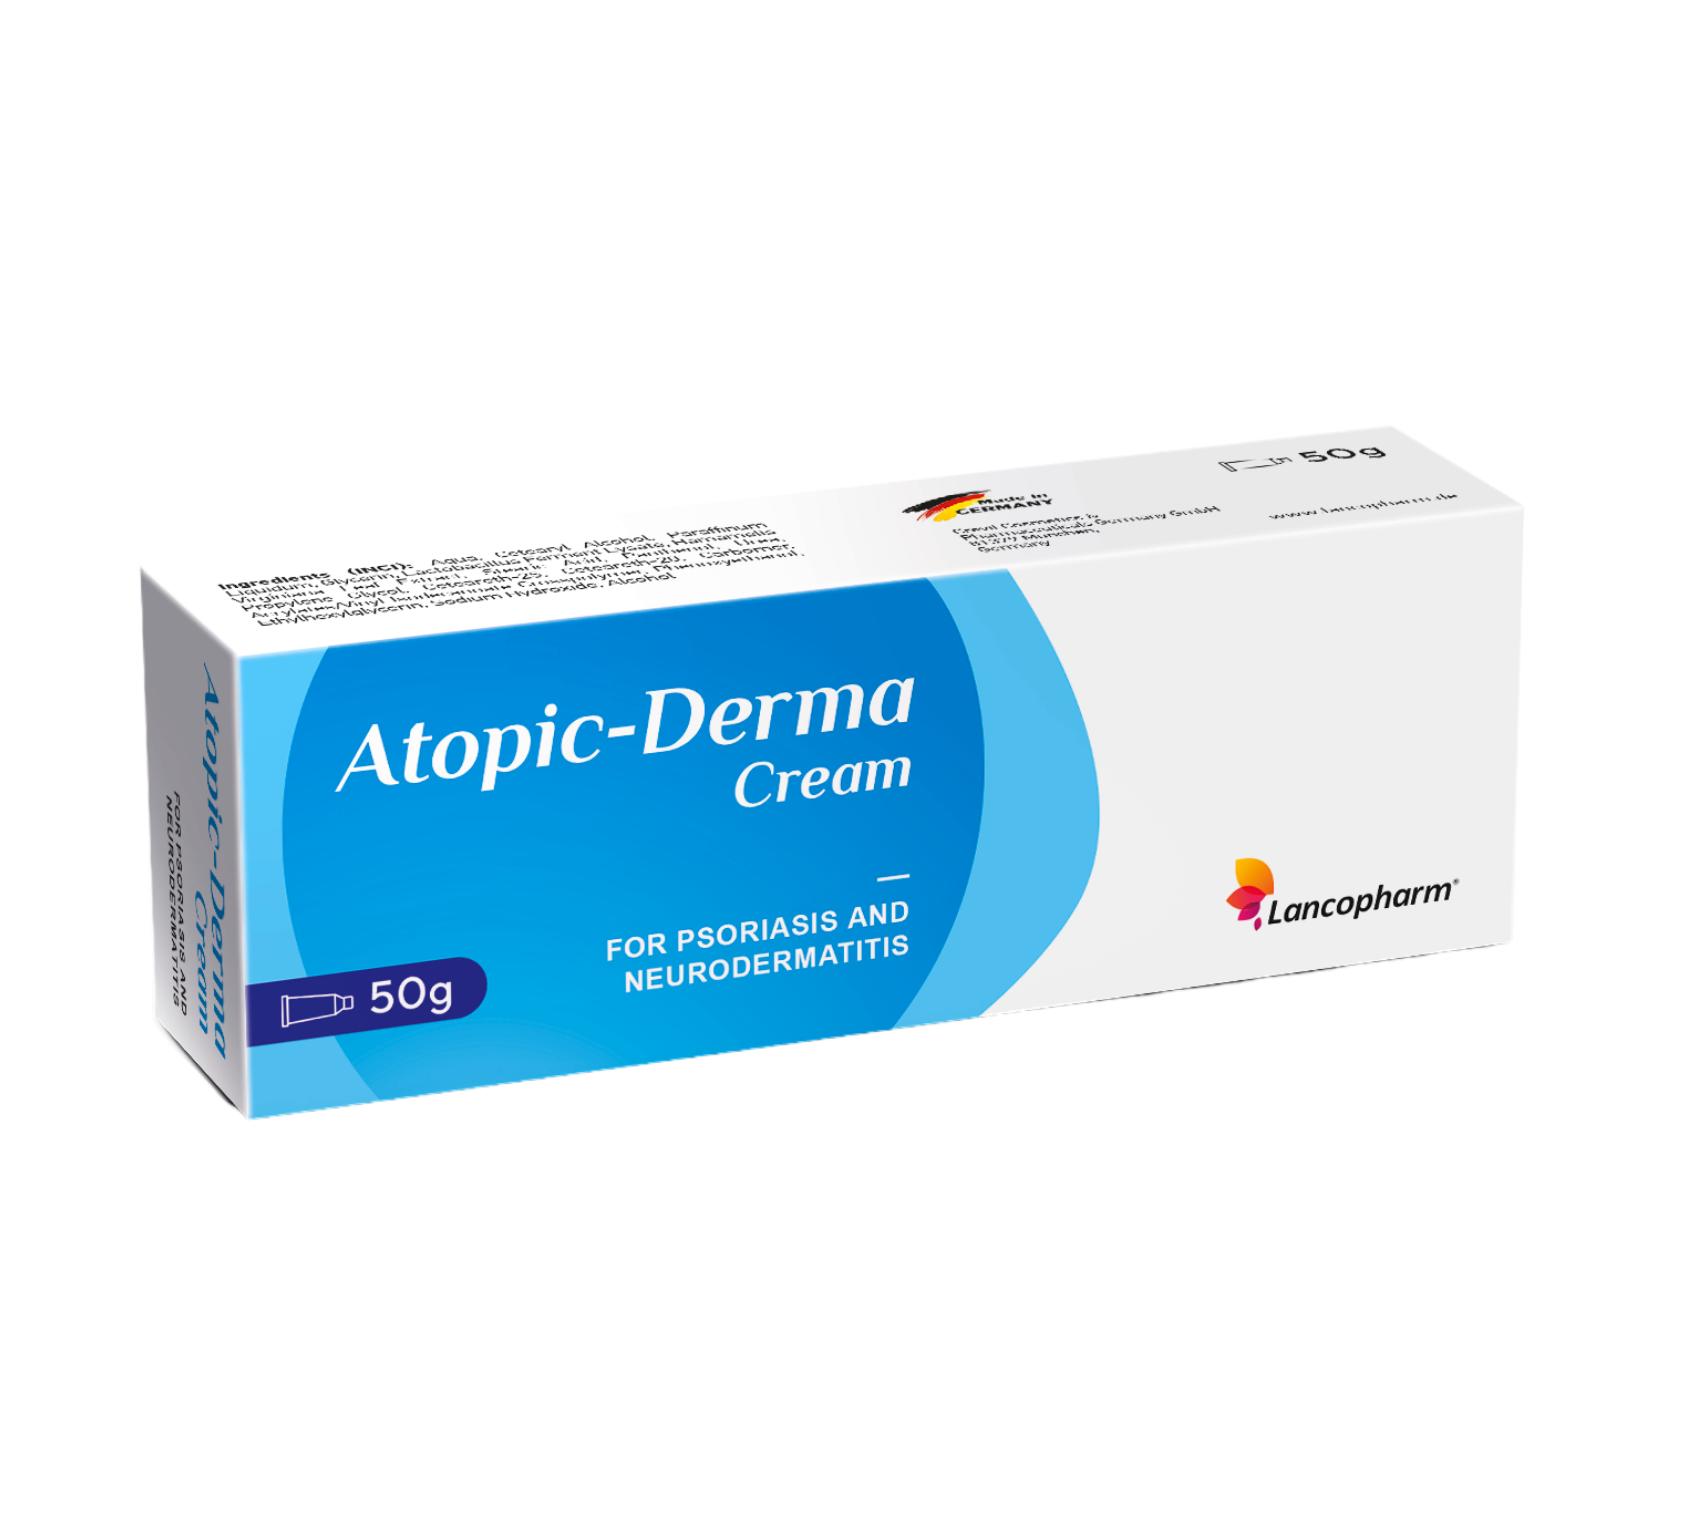 dermatitis cream for skin